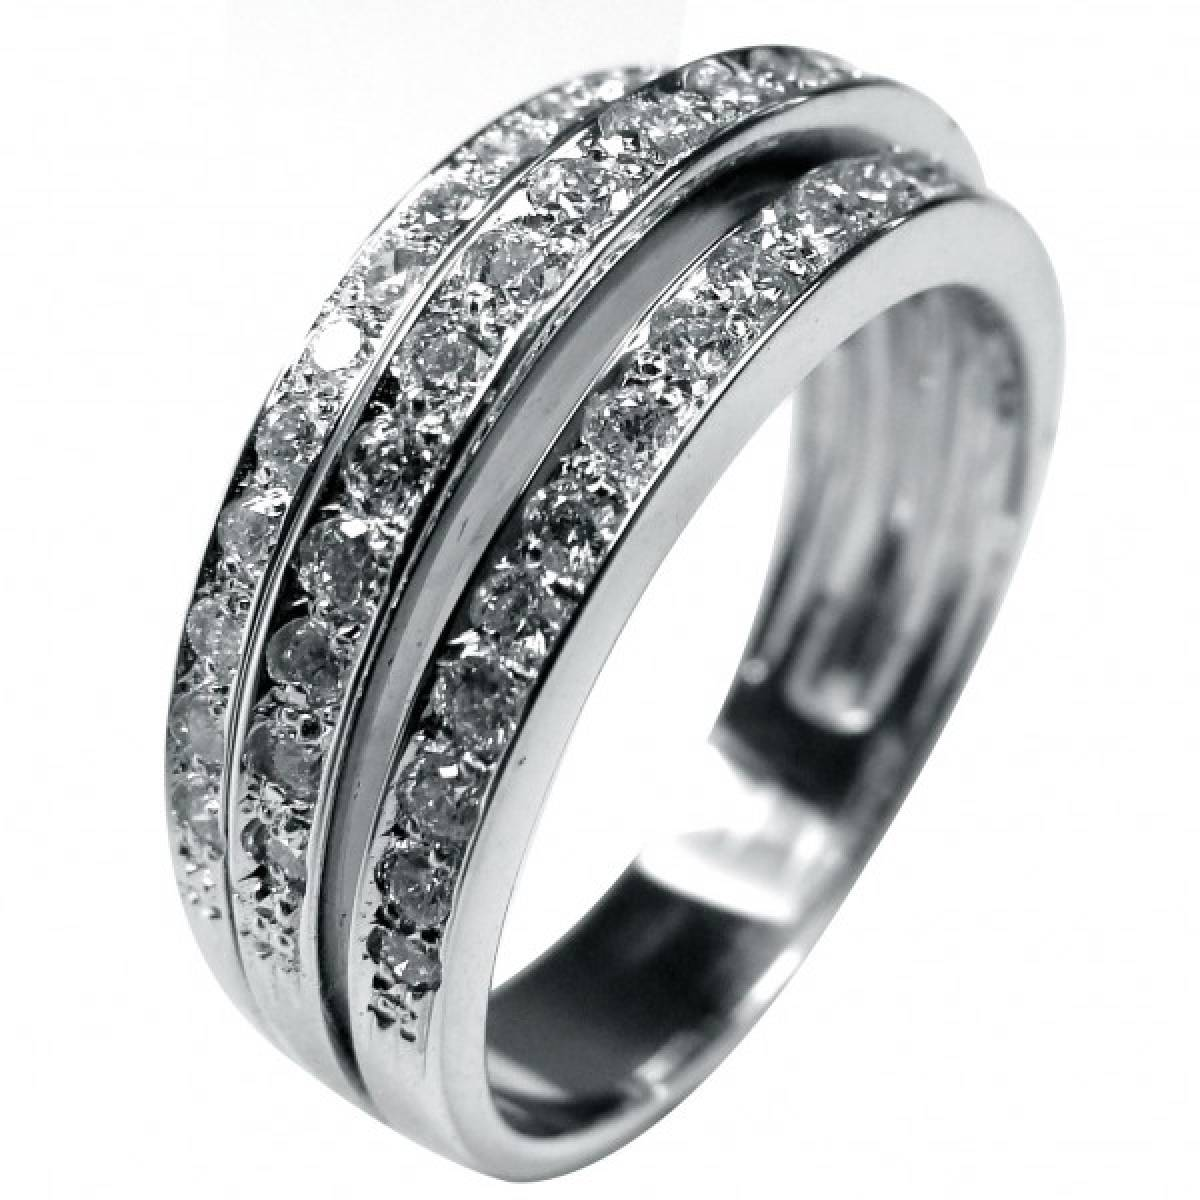 Anel de Noivado ouro branco de 19 kts, com diamantes ou zircónias